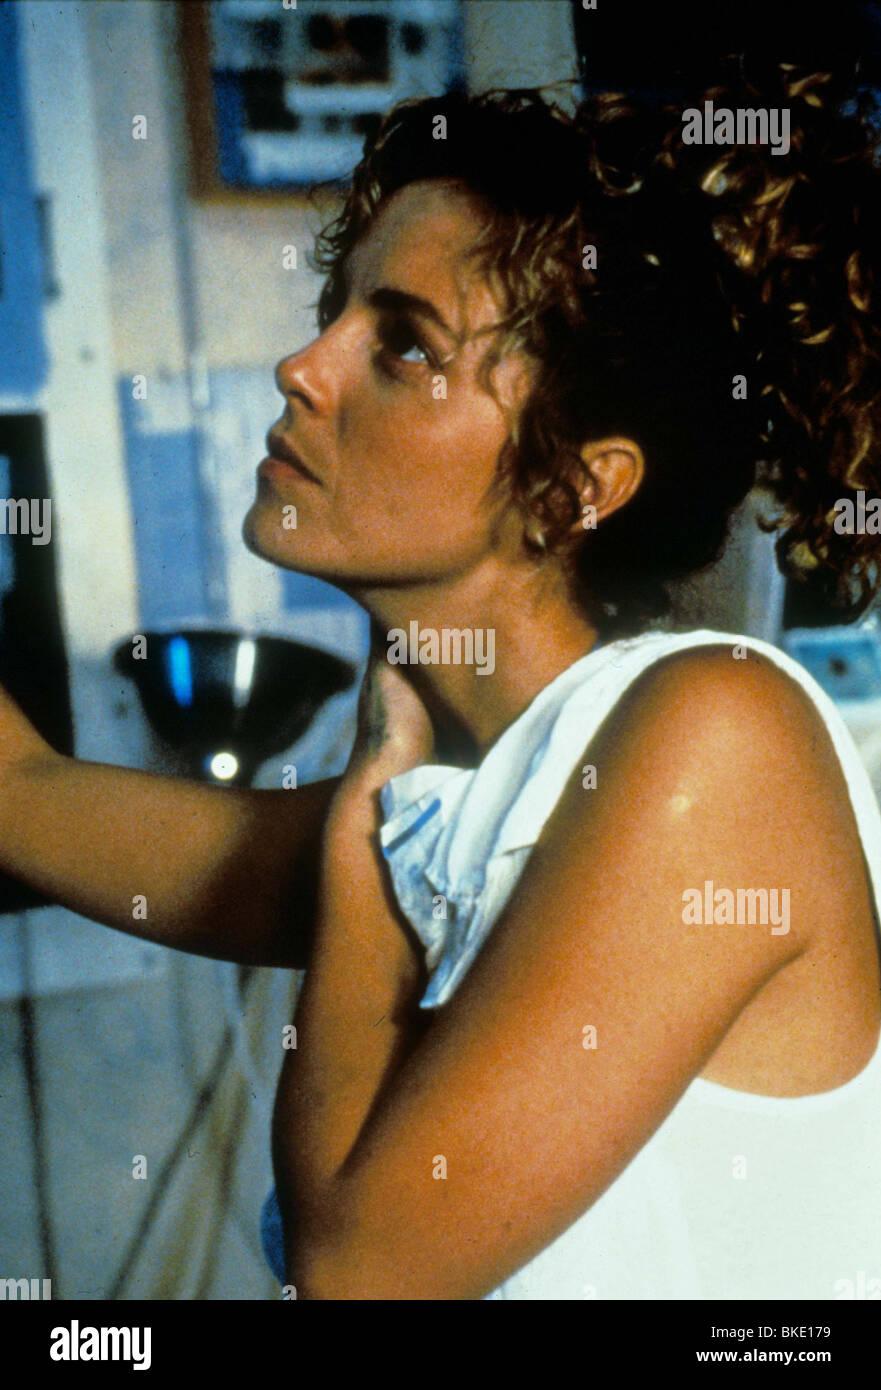 THE PLAYER -1991 GRETA SCACCHI - Stock Image